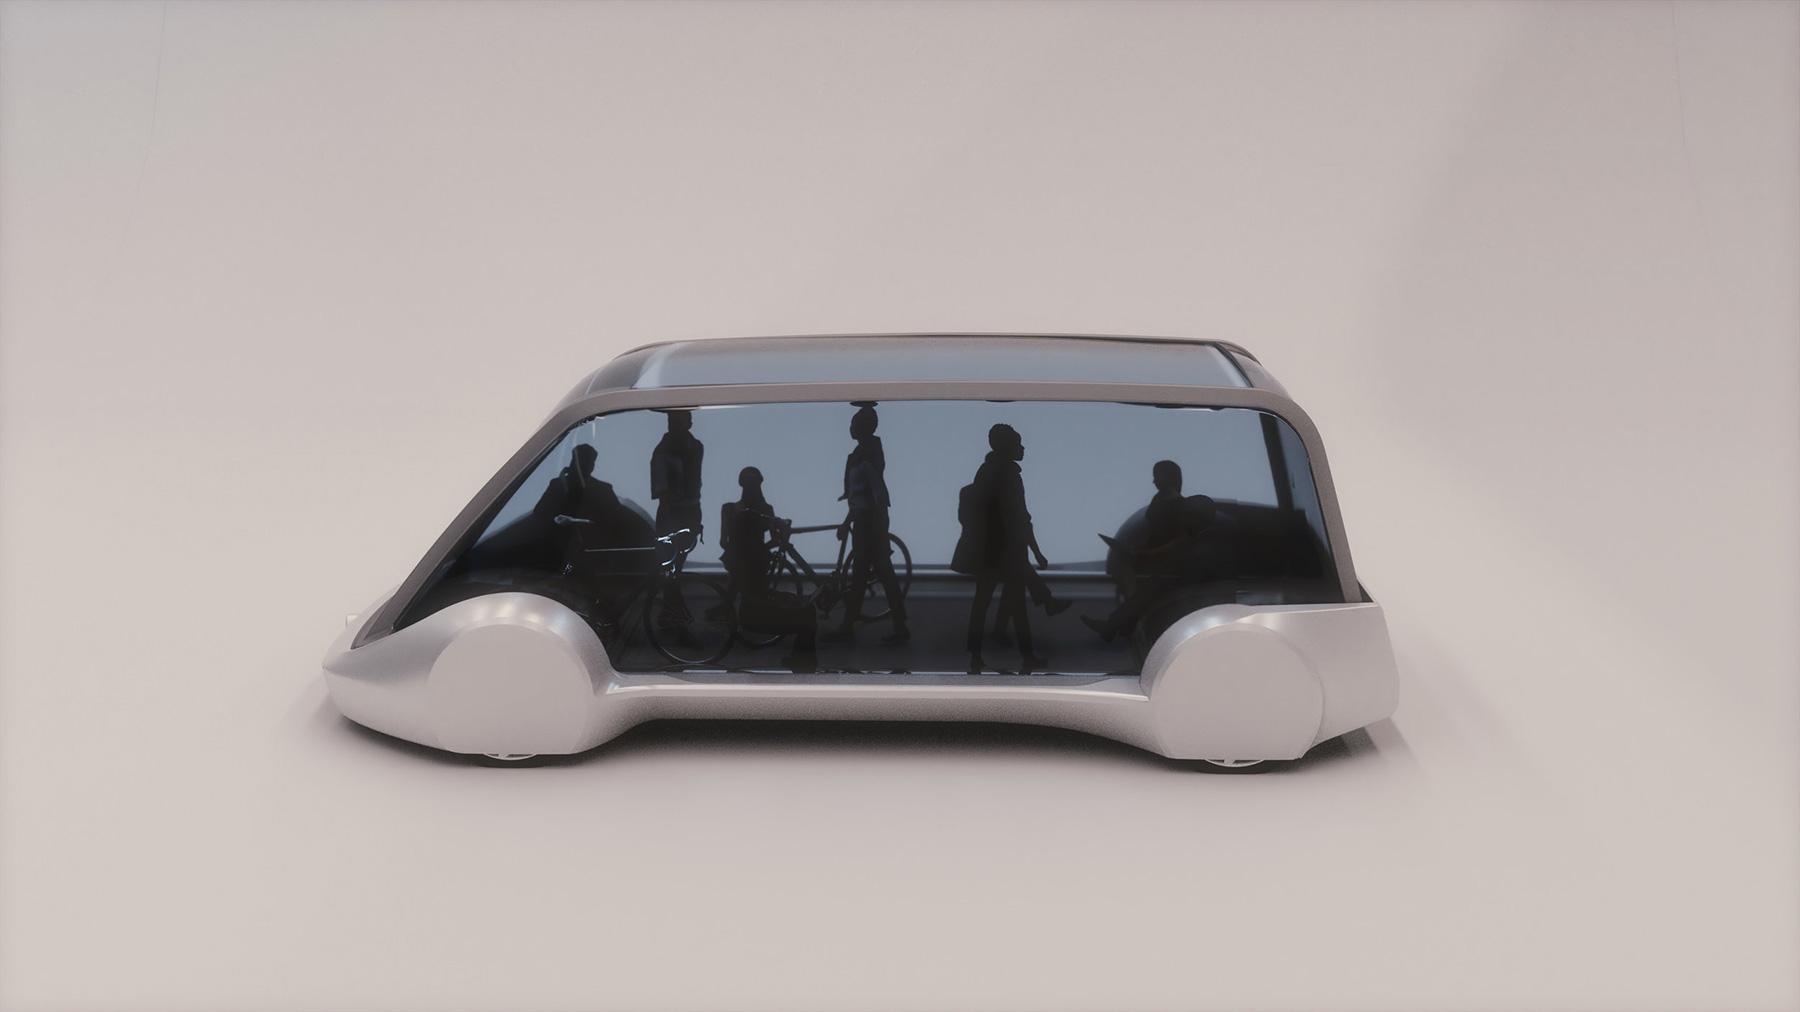 Elon Musk's Boring Company Teases Underground Transit Vehicle